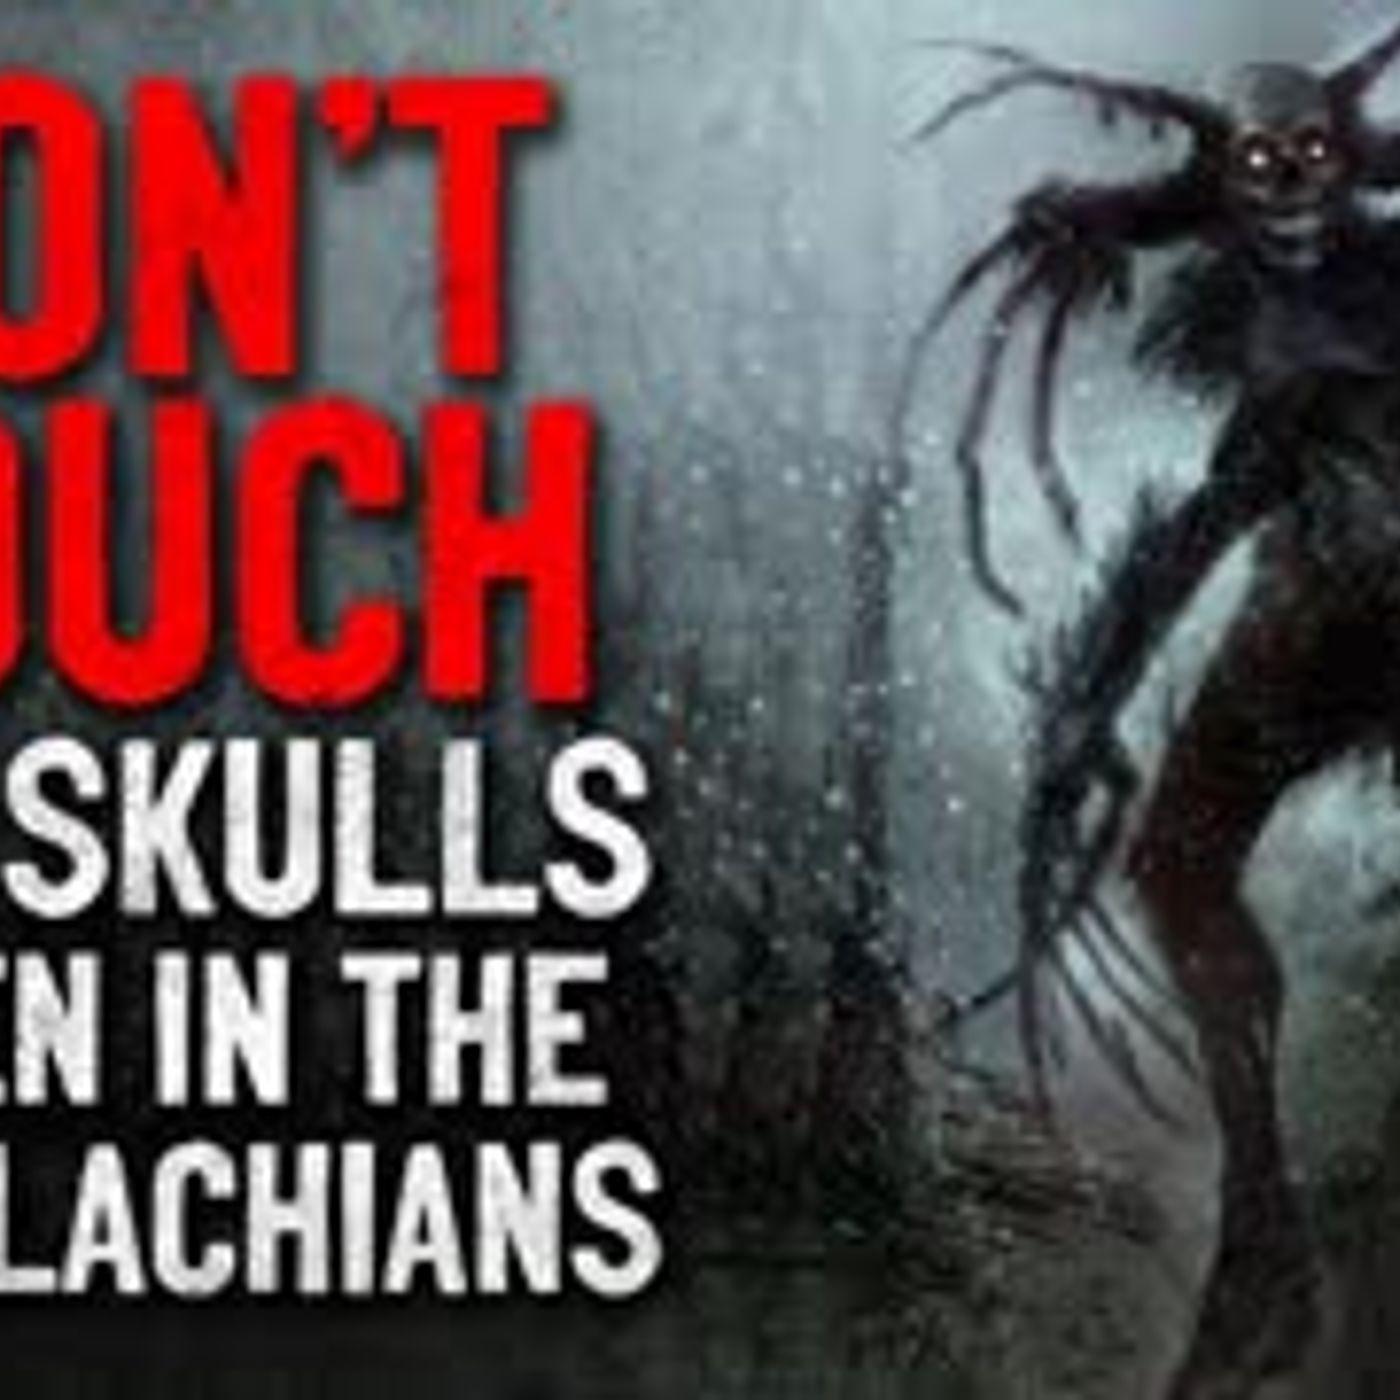 """Don't touch the skulls when in the Appalachians"" Creepypasta"